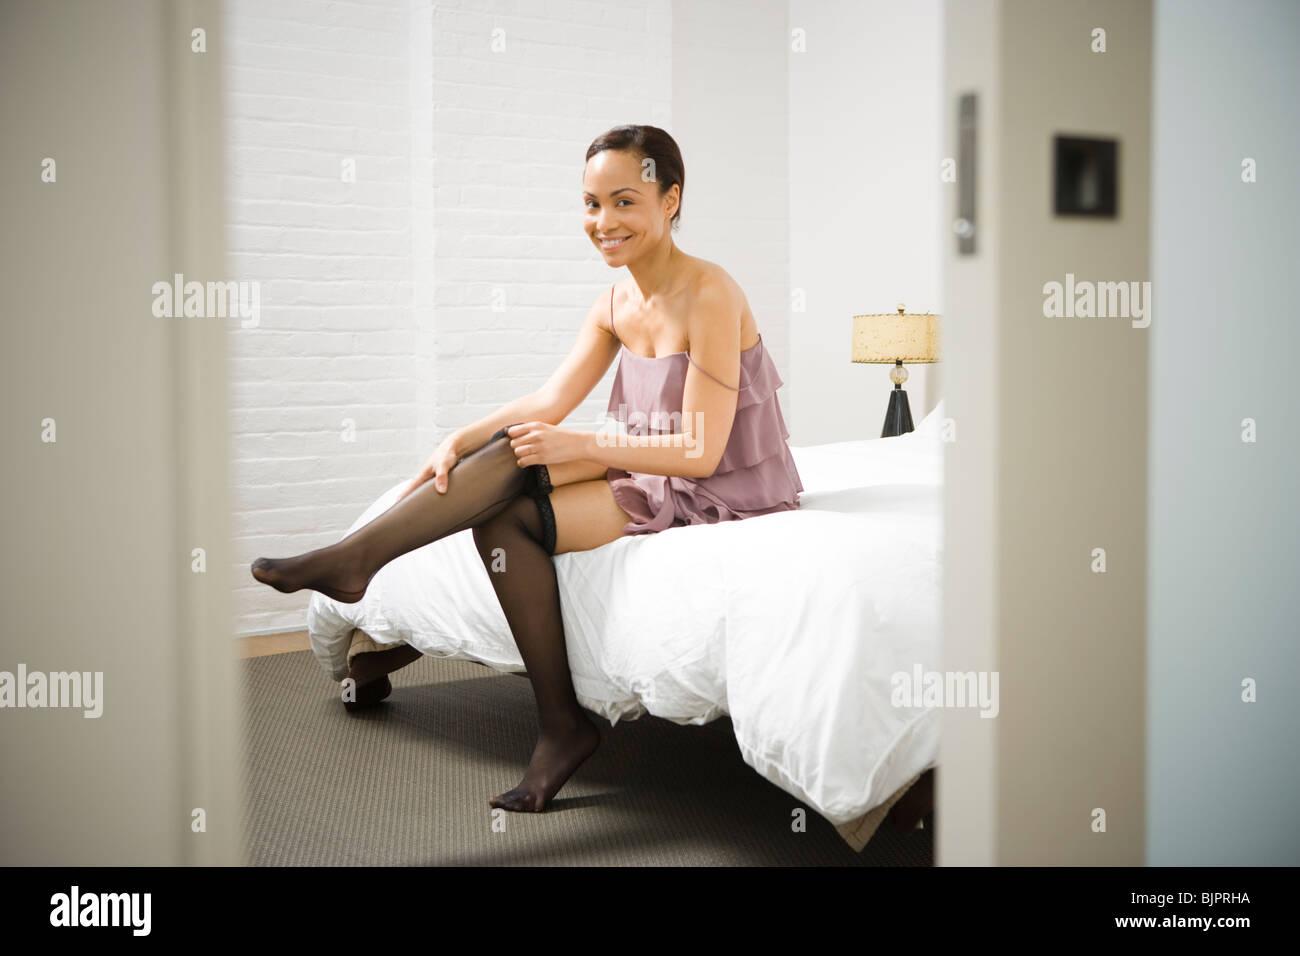 Woman Putting On Pantyhose Stock Photo Royalty Free Image